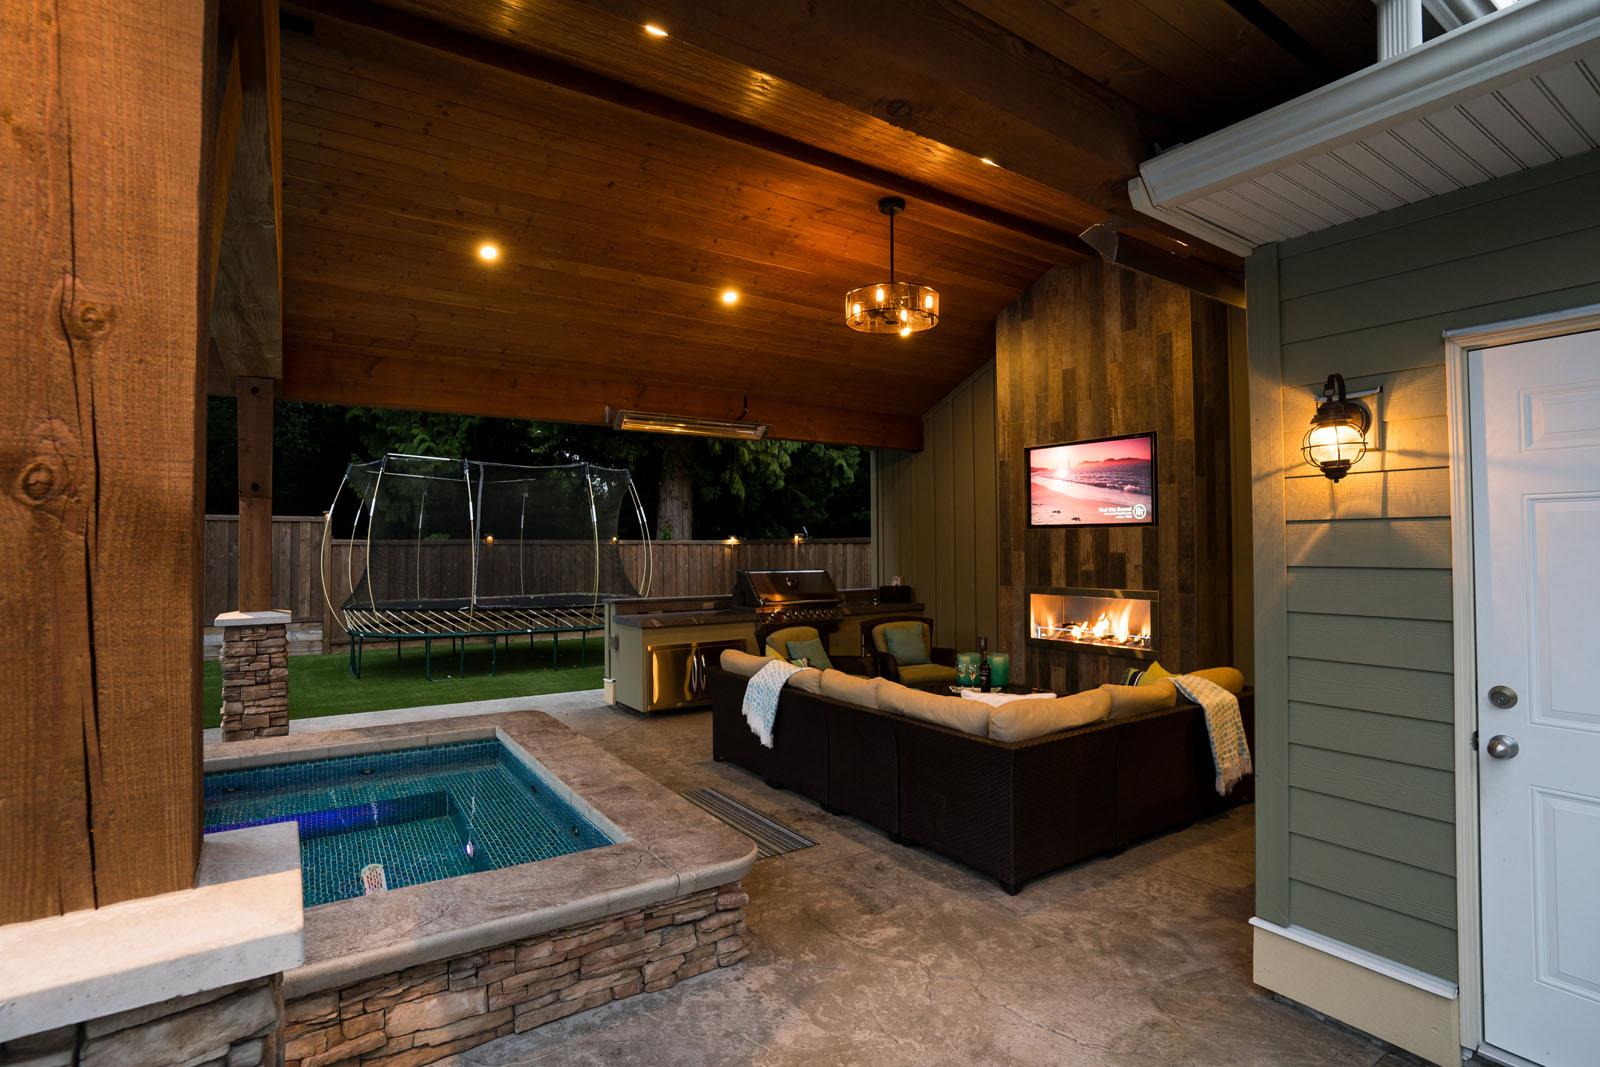 backyard-renovation-azuro-LEH023